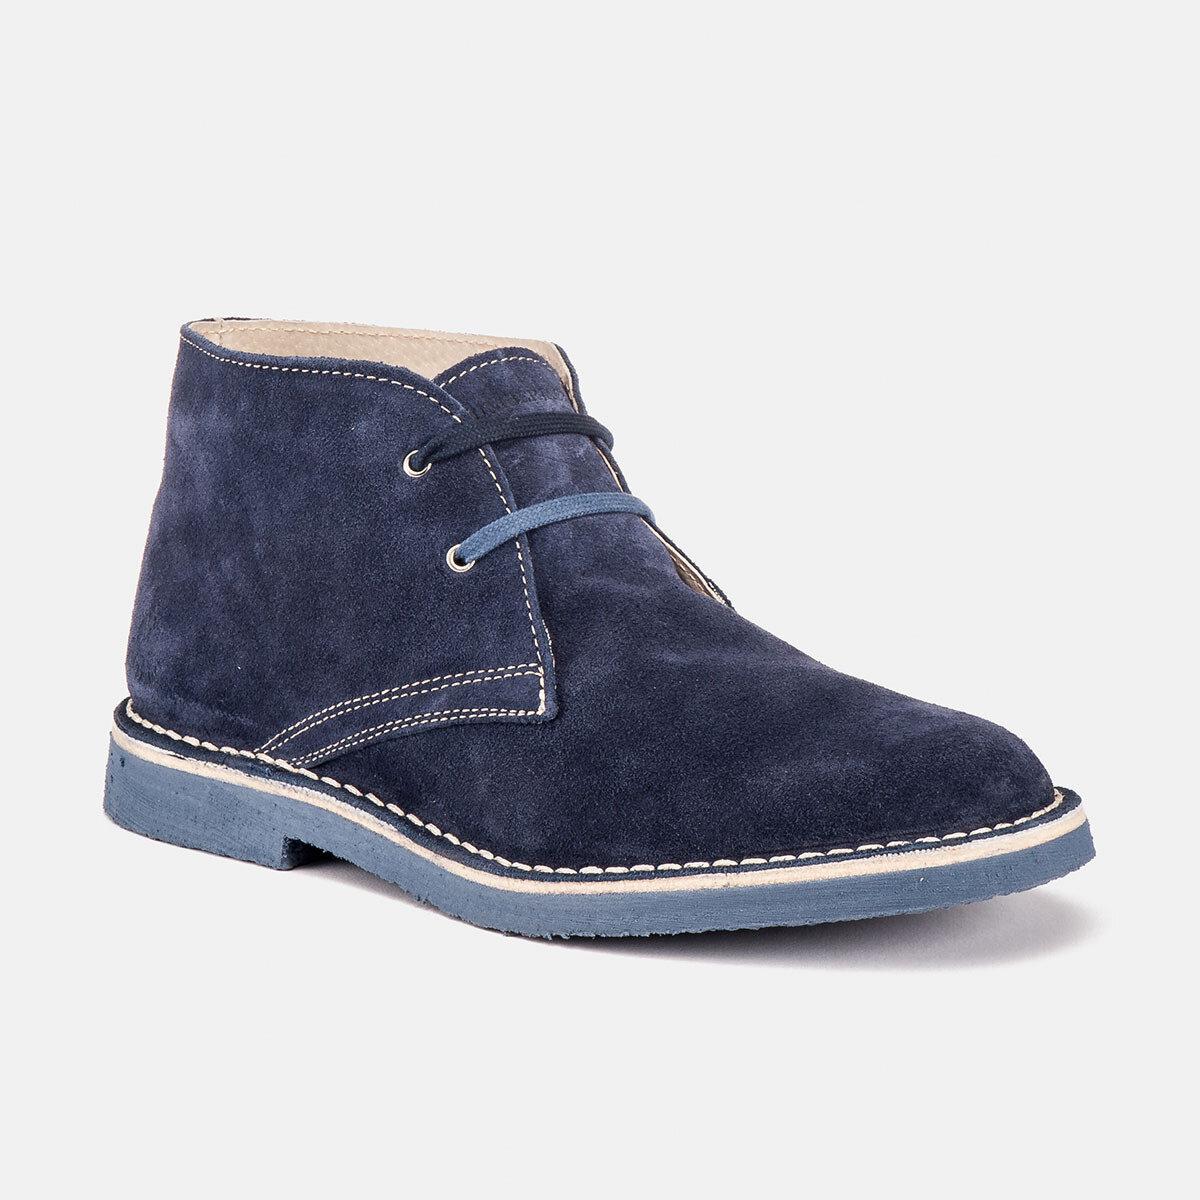 GABLE JEANS/AVIO Man Ankle boots